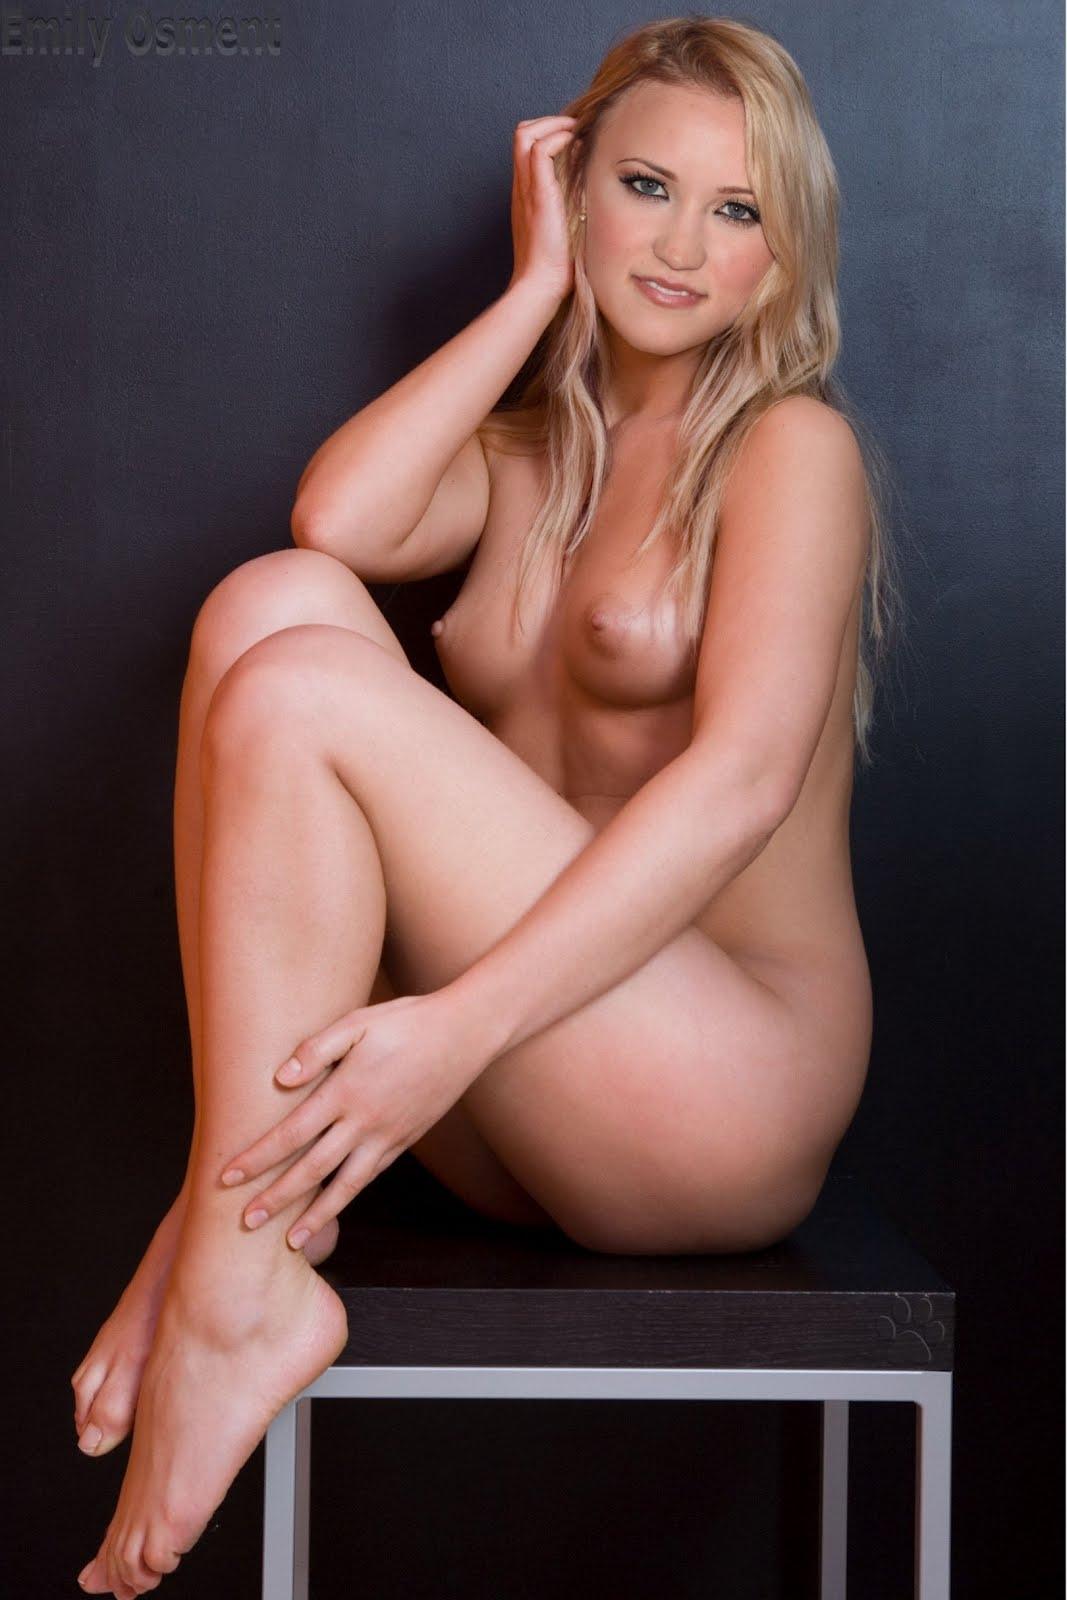 Emily osment foto desnuda